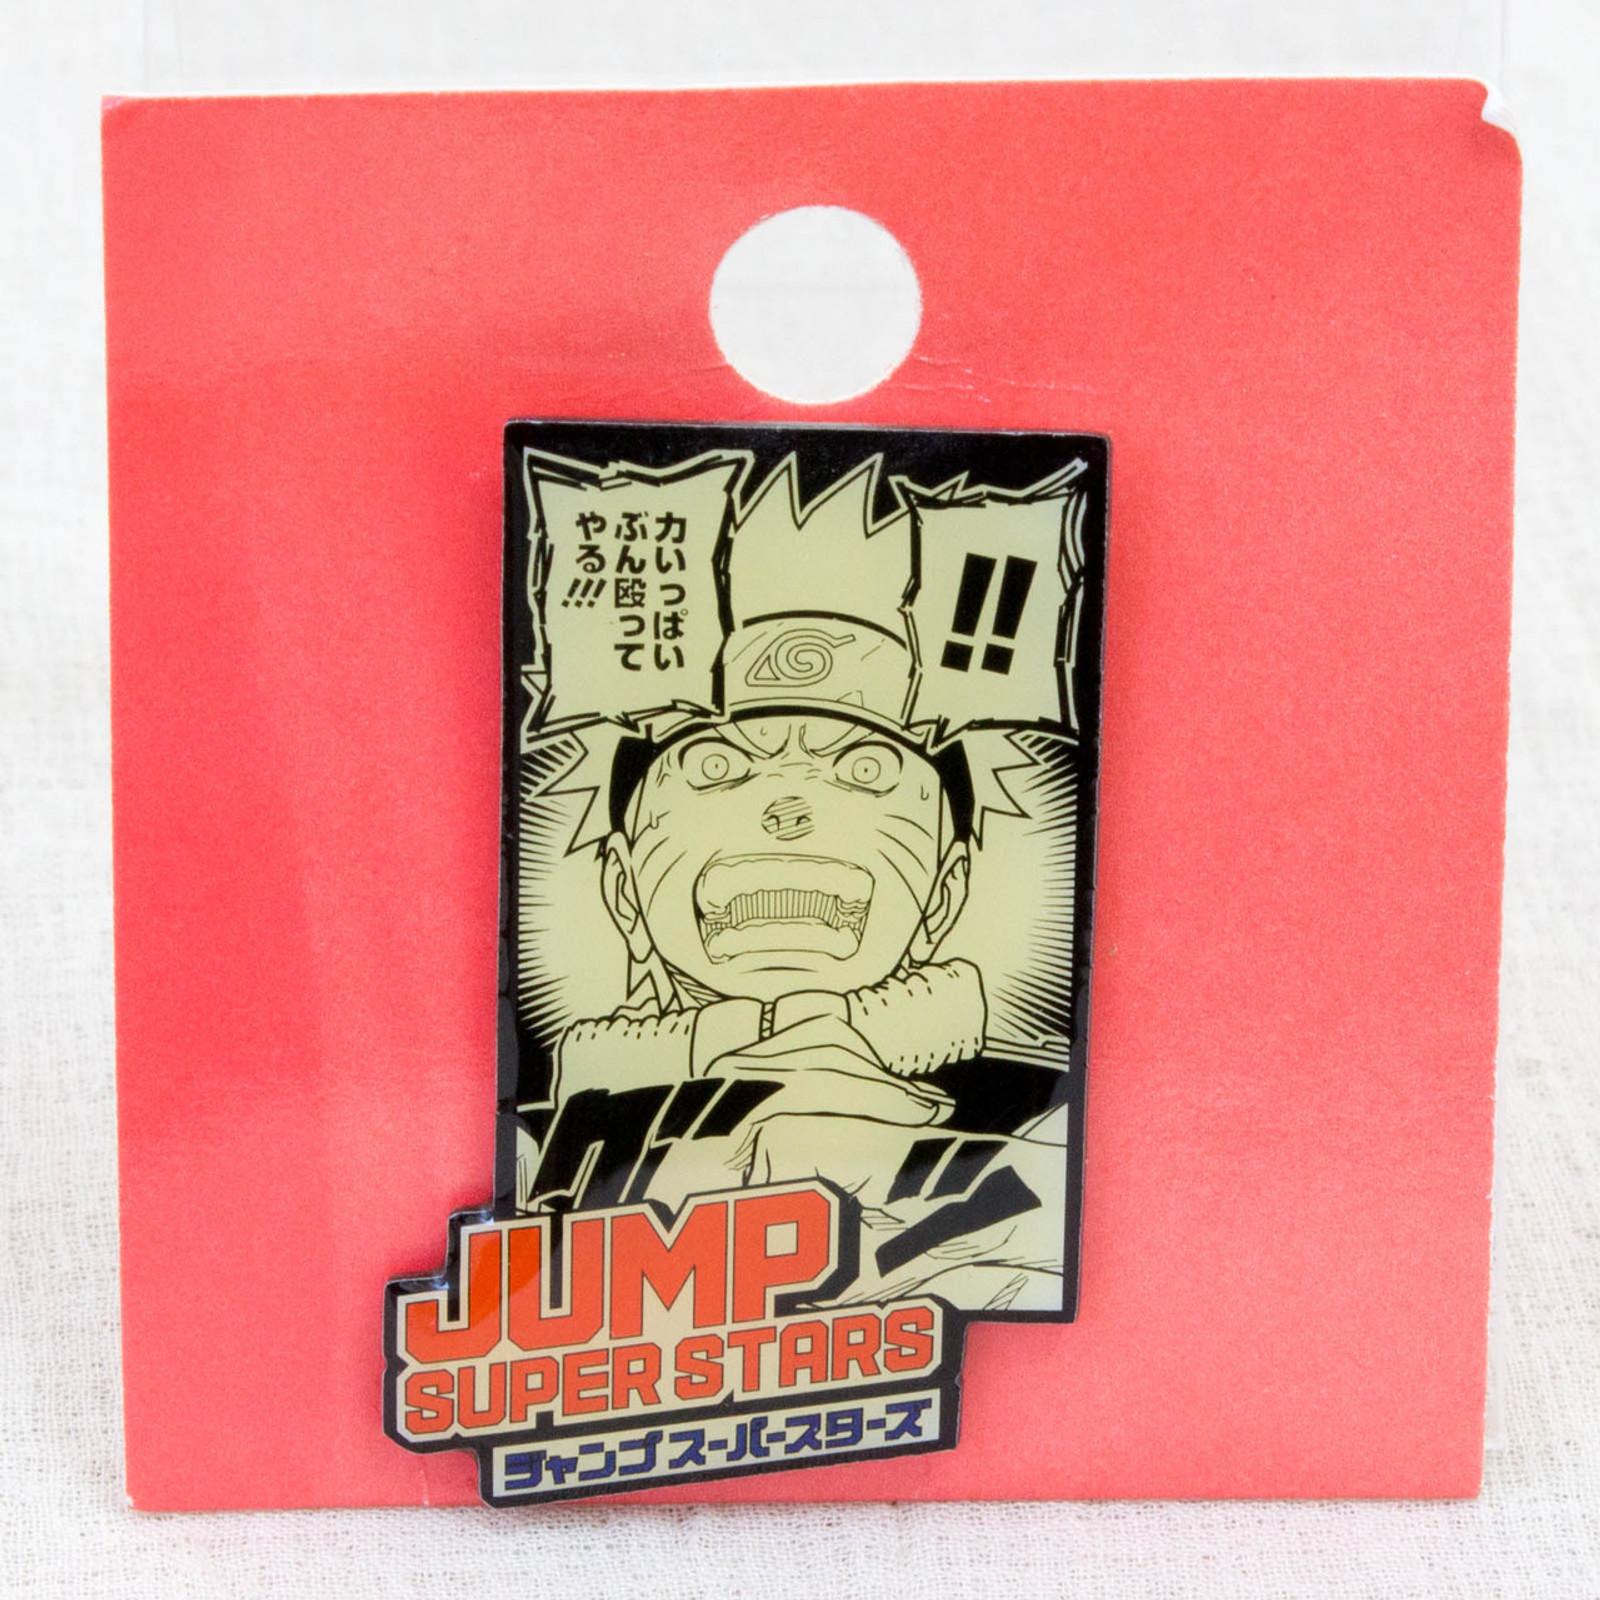 NARUTO Shonen Jump Super Stars Pins JAPAN ANIME MANGA